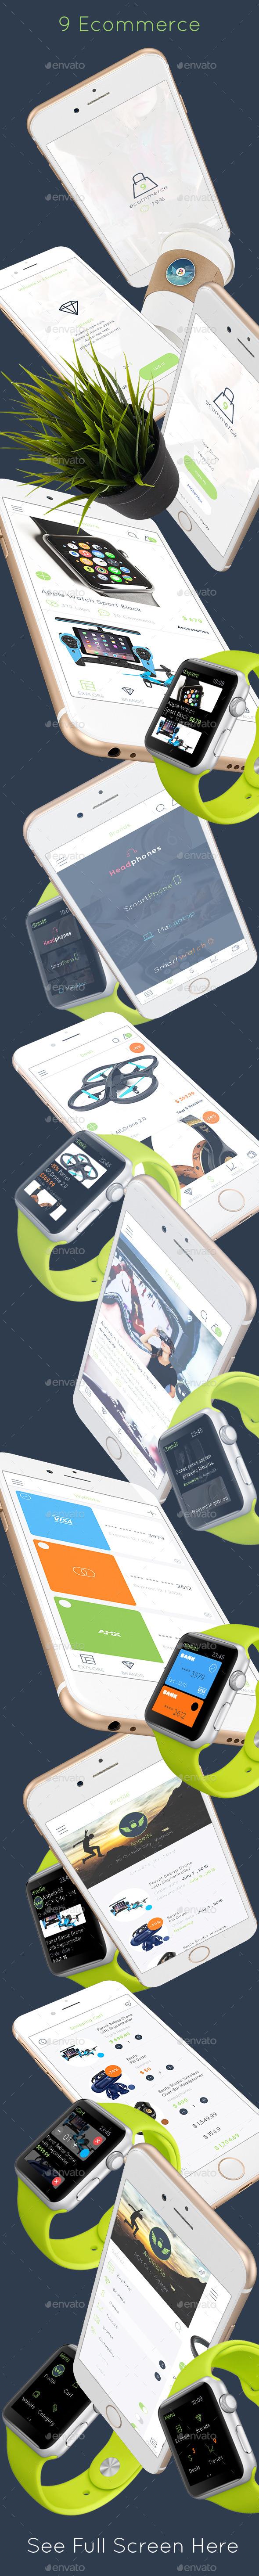 9 Ecommerce Mobile UI Kit - User Interfaces Web Elements